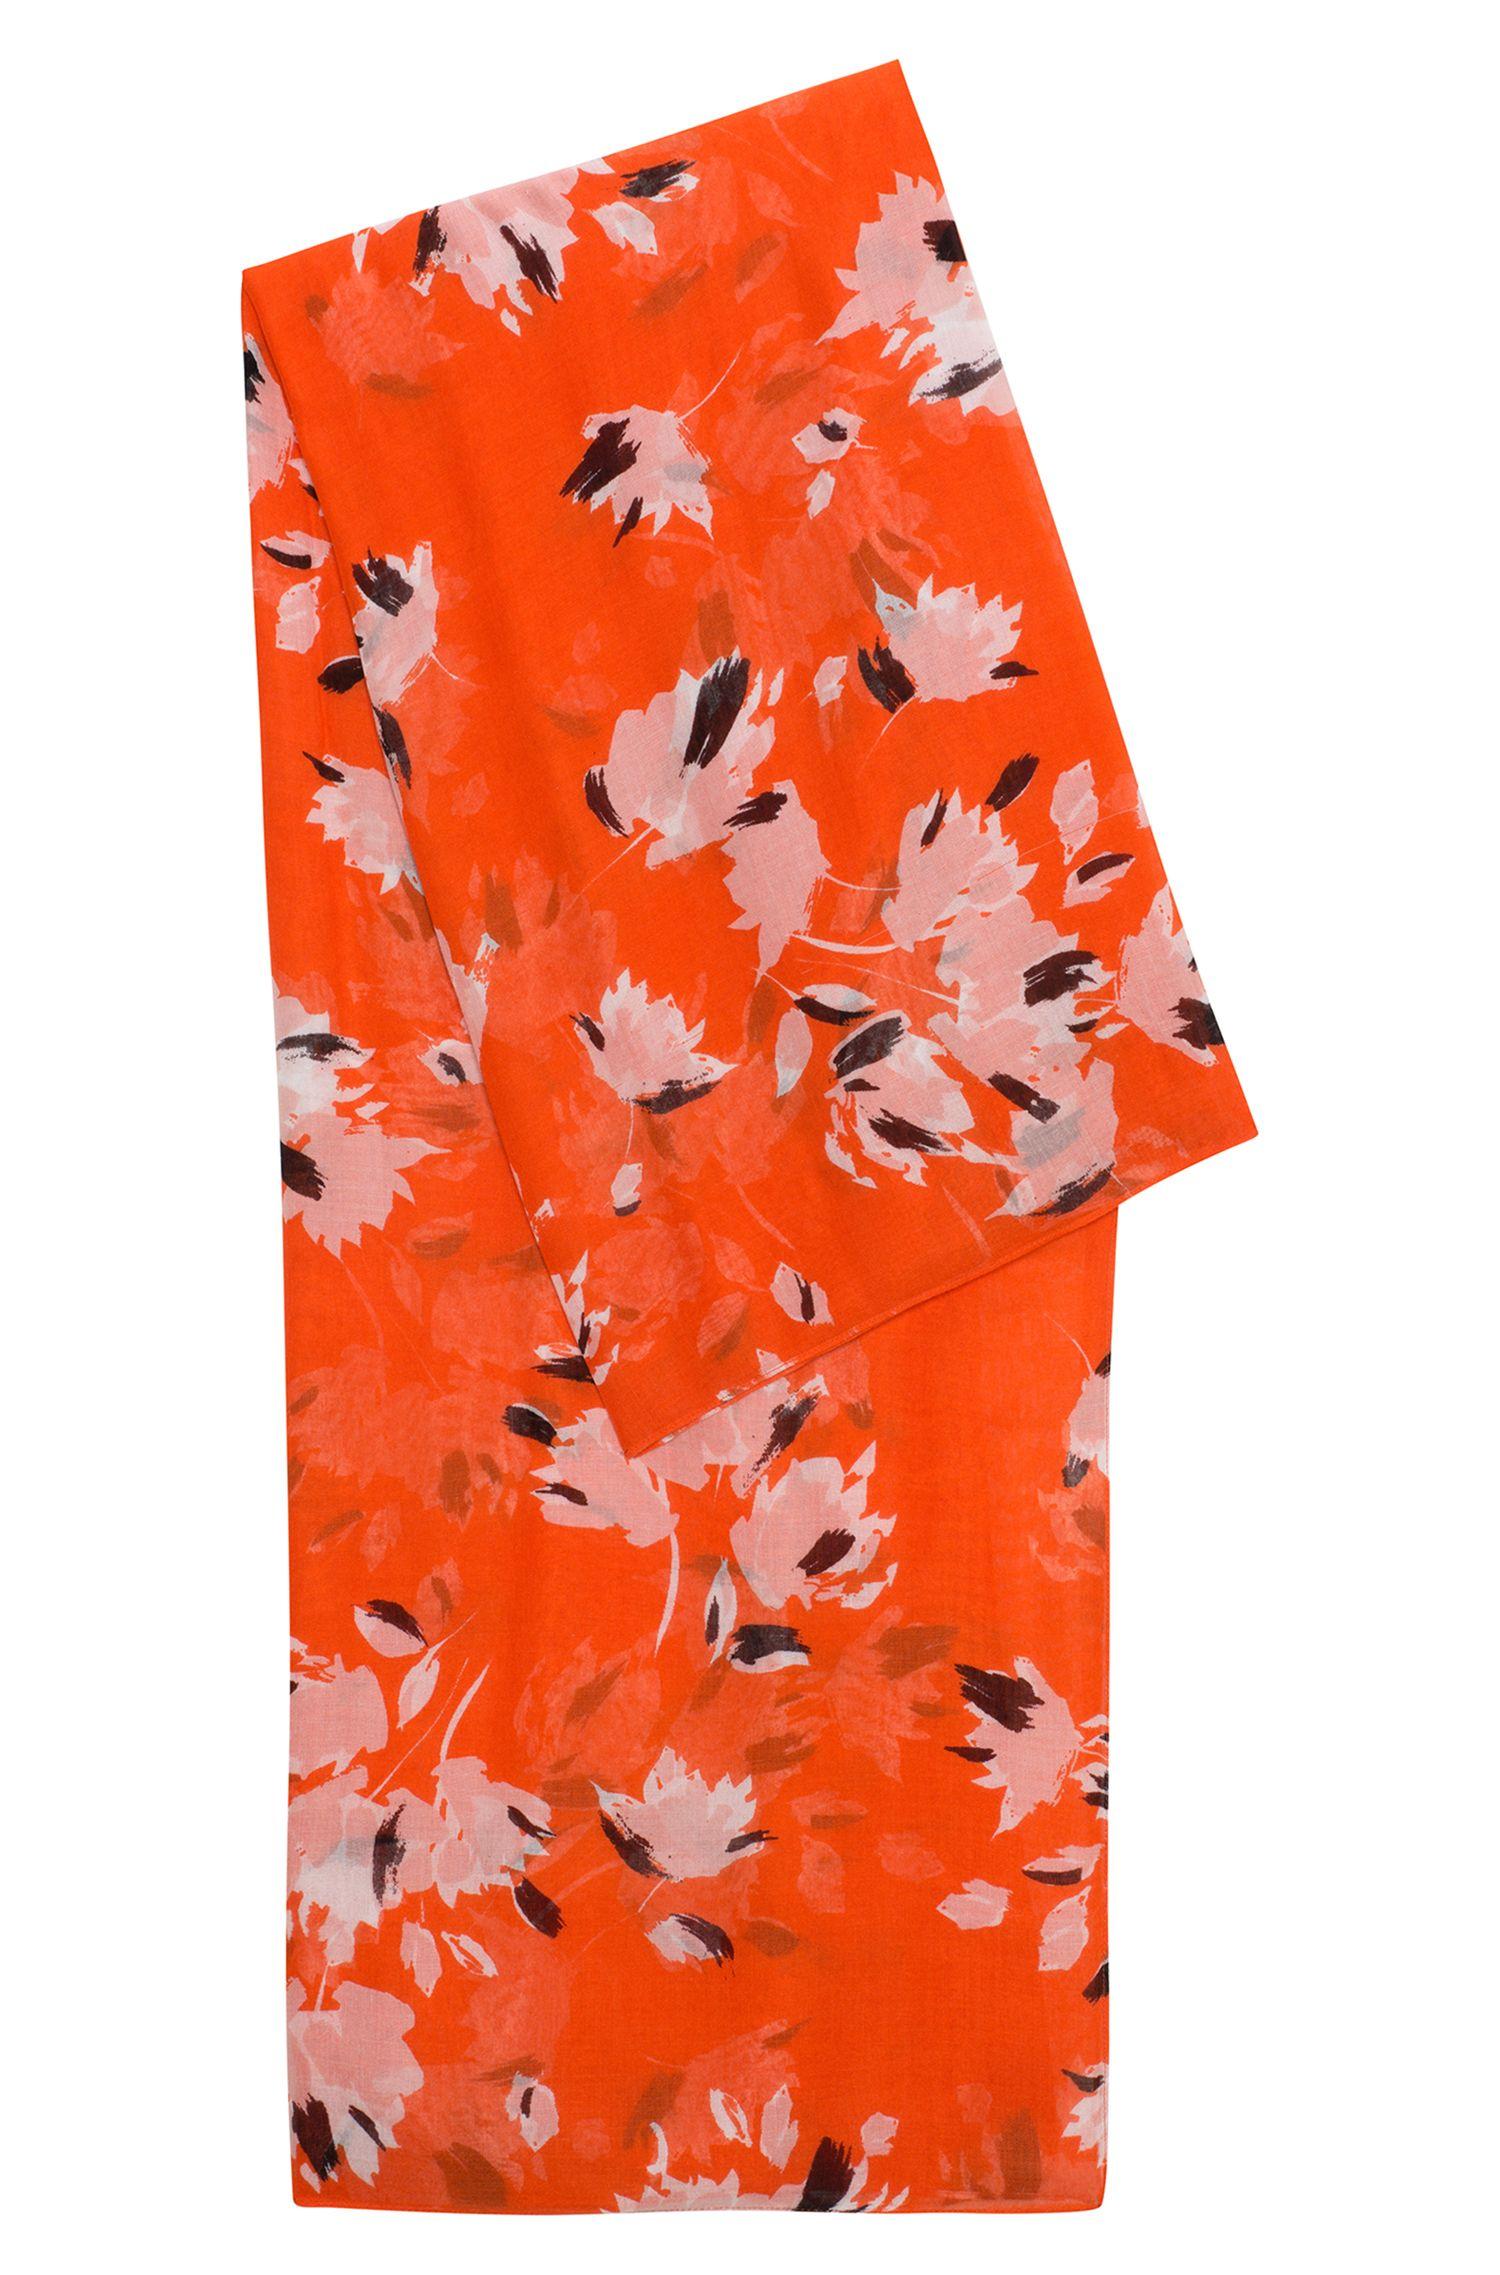 Schal aus leichtem Modal mit abstraktem Blumenprint